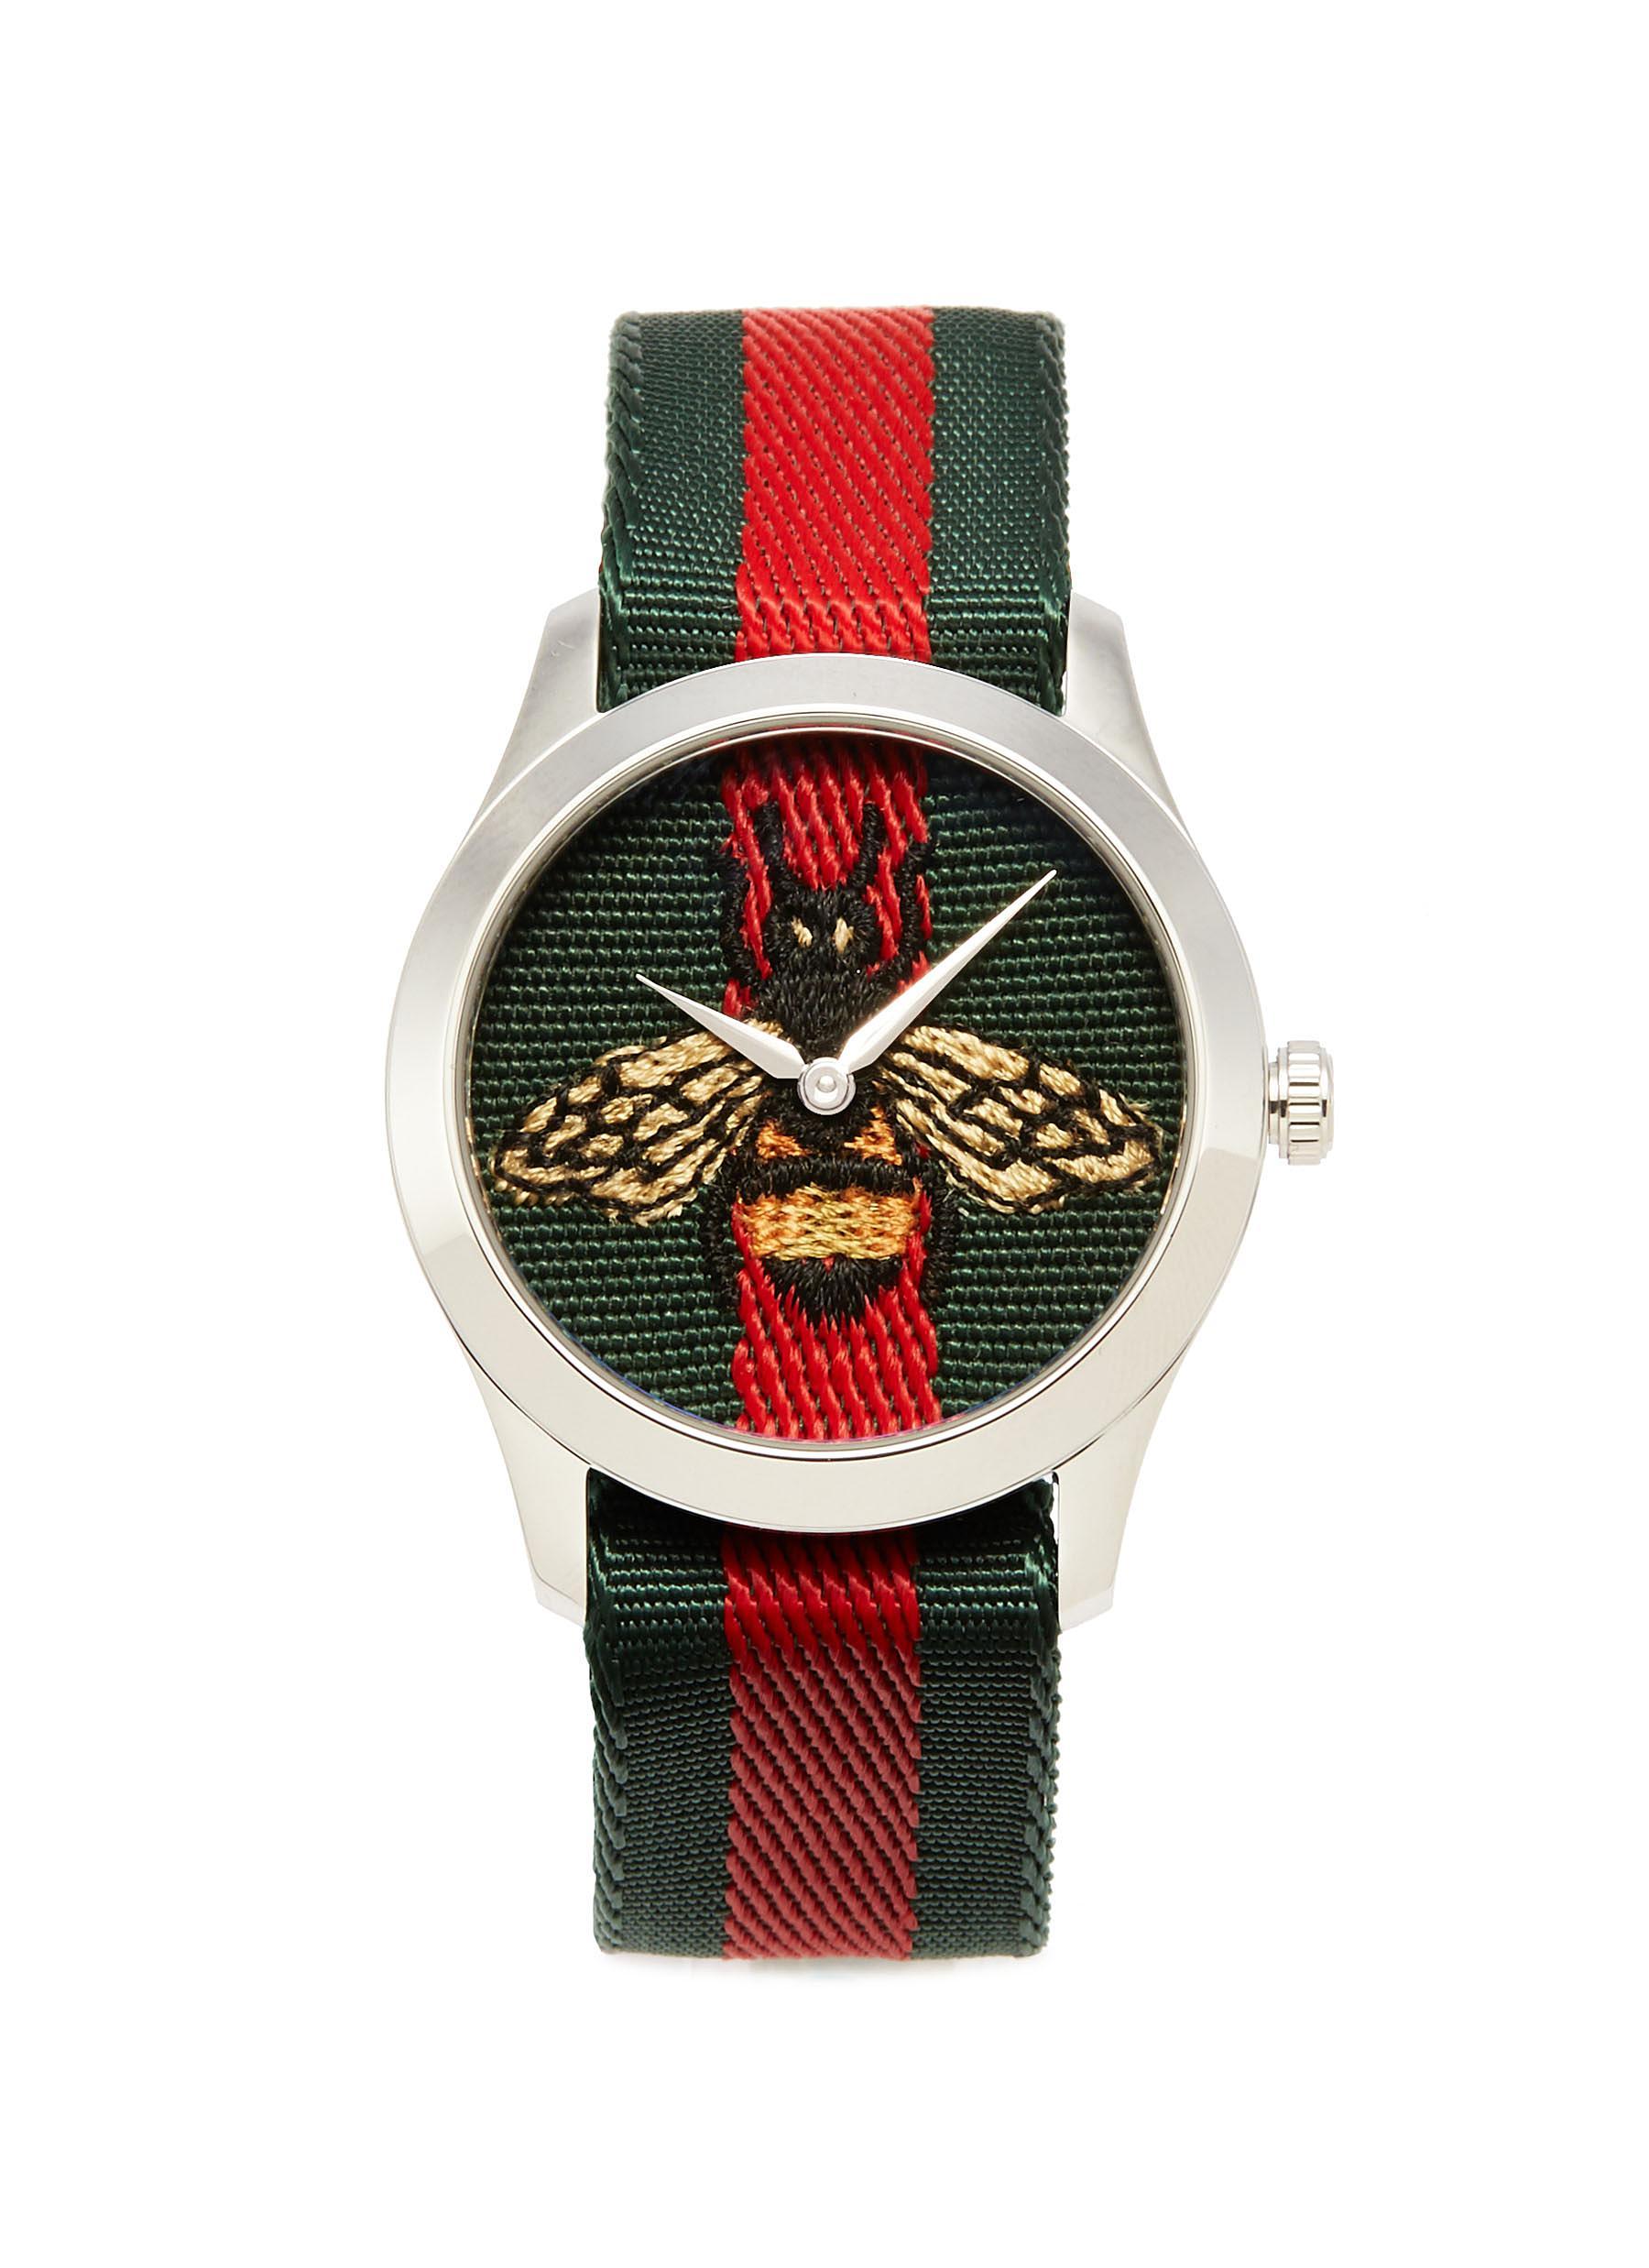 c187c3ce5f6 Gucci.  Le Marché des Merveilles  bee embroidered 38mm watch